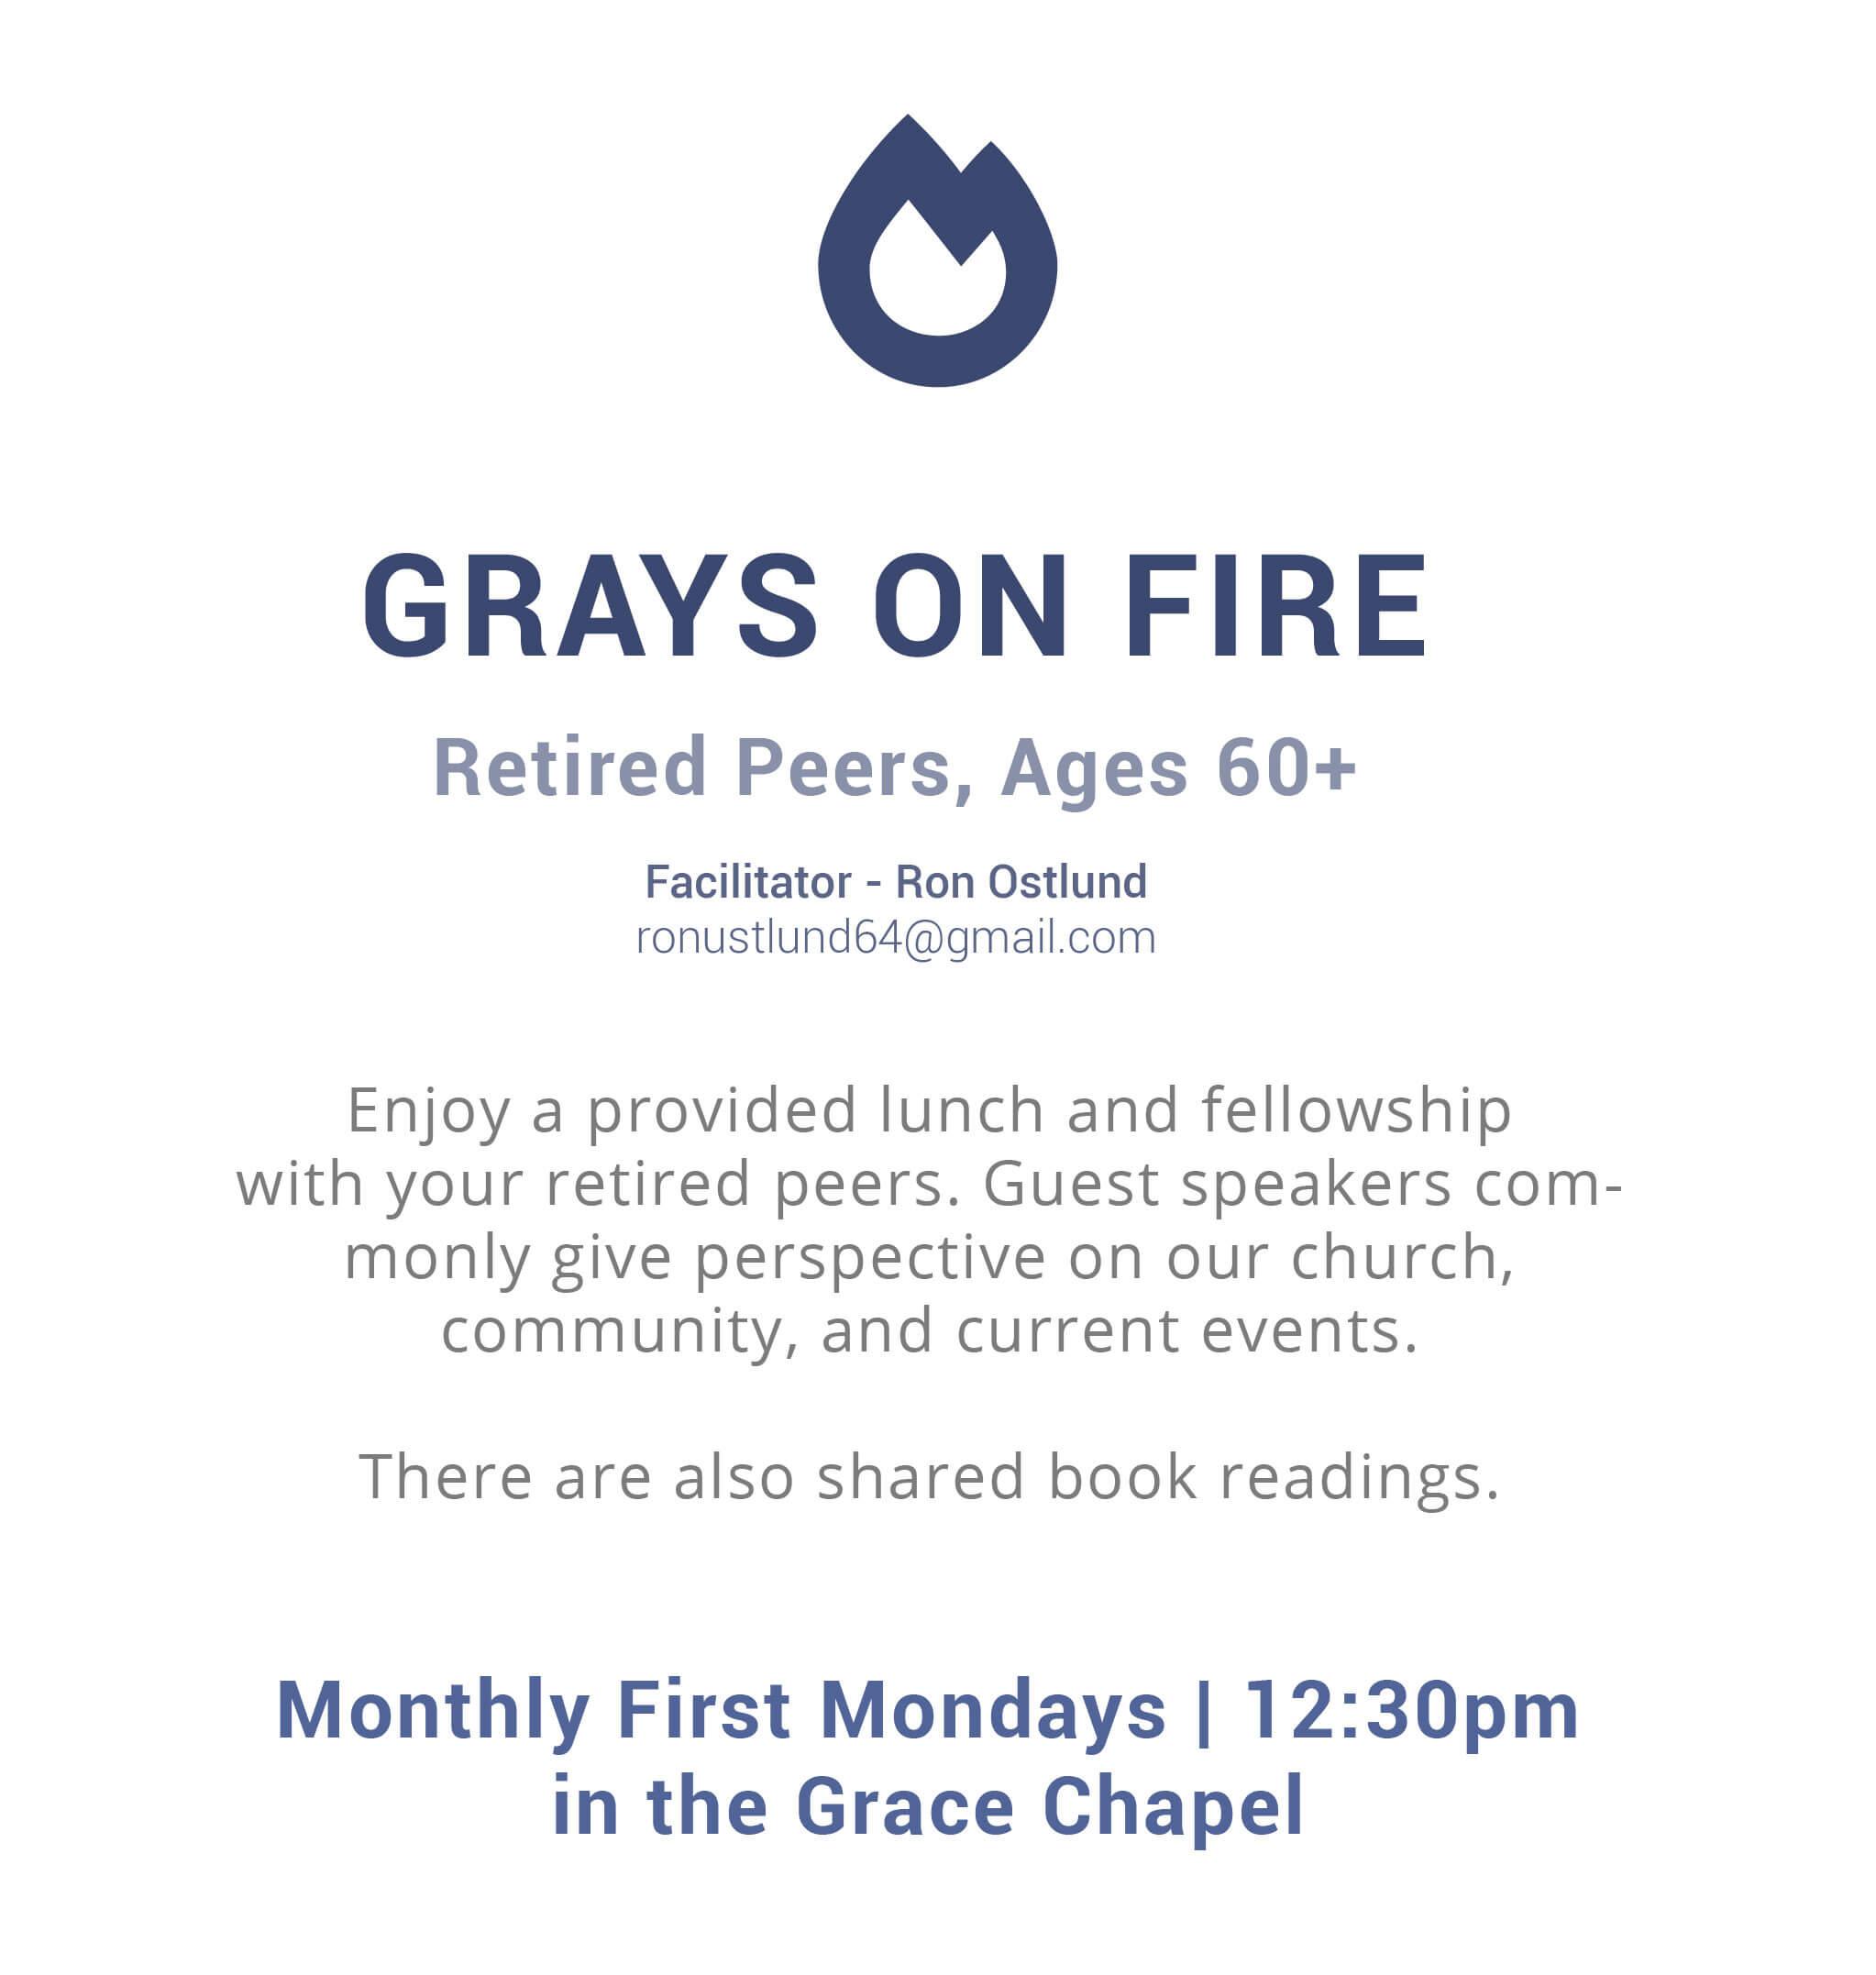 GraysOnFire_Grays On Fire